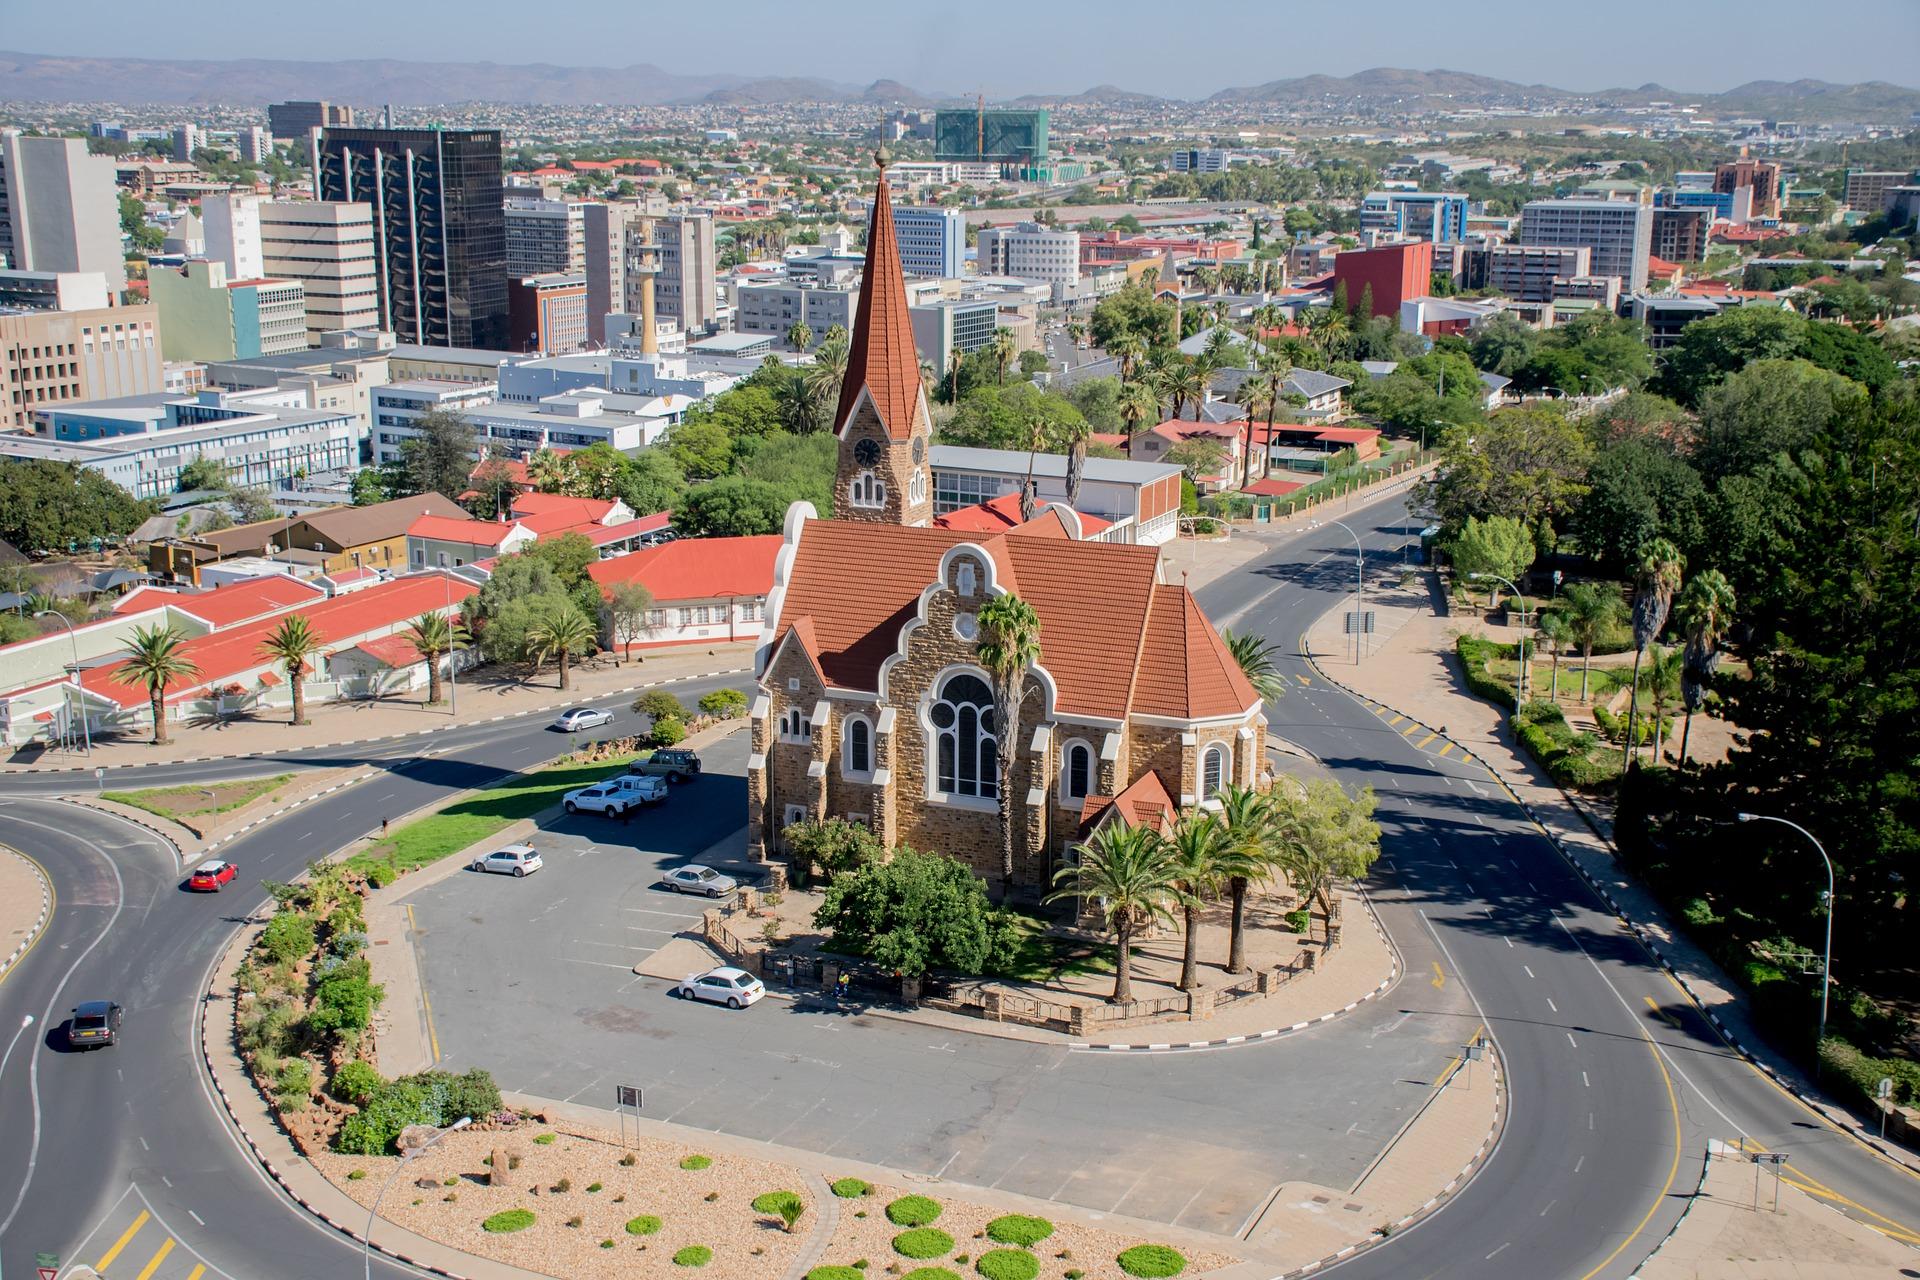 Pixabay – Windhoek